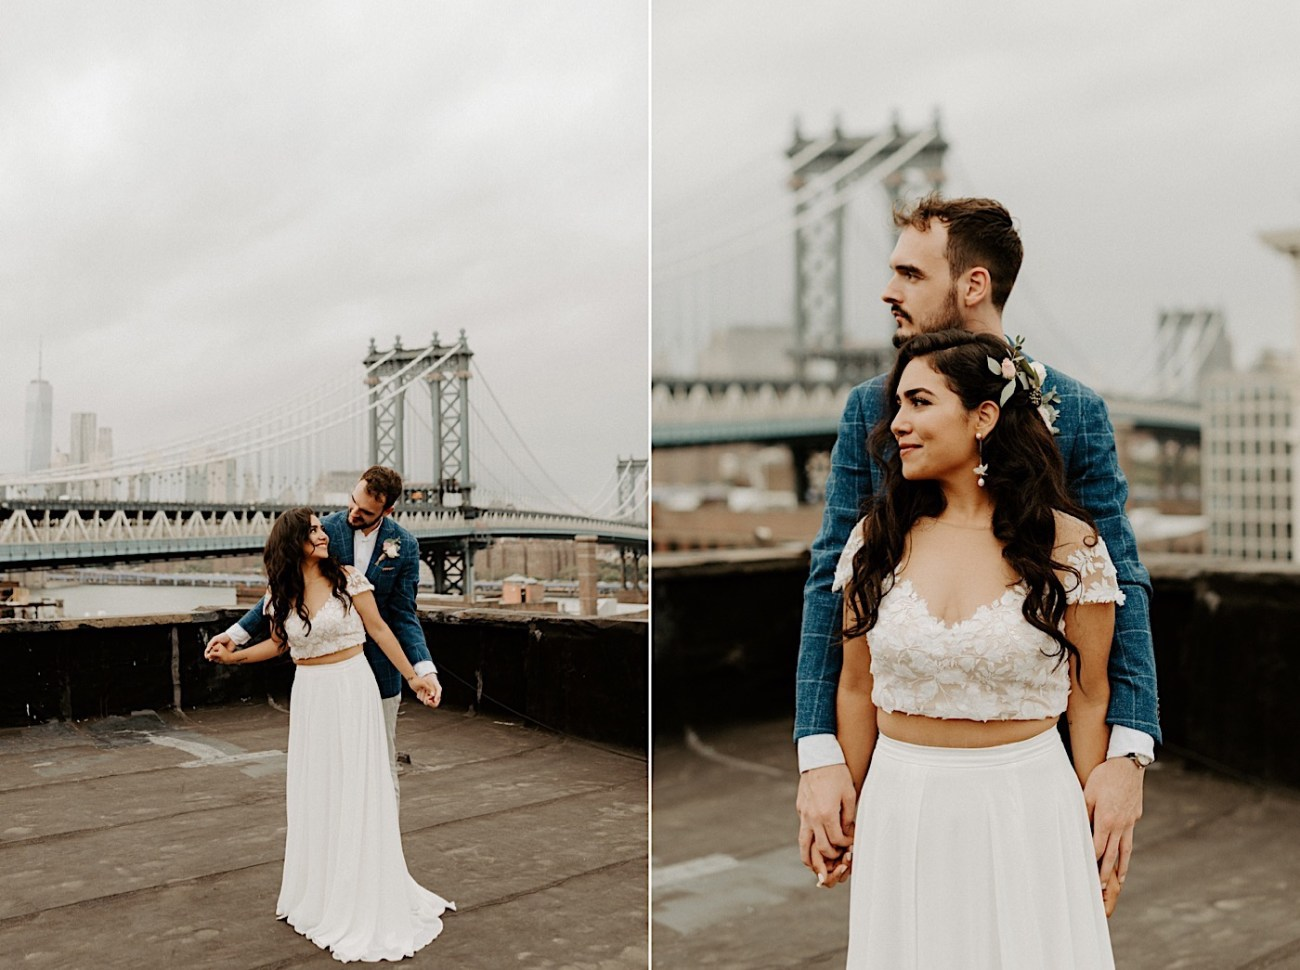 LIC Wedding Greenpoint Wedding LIC Elopement New York Wedding Photographer 089